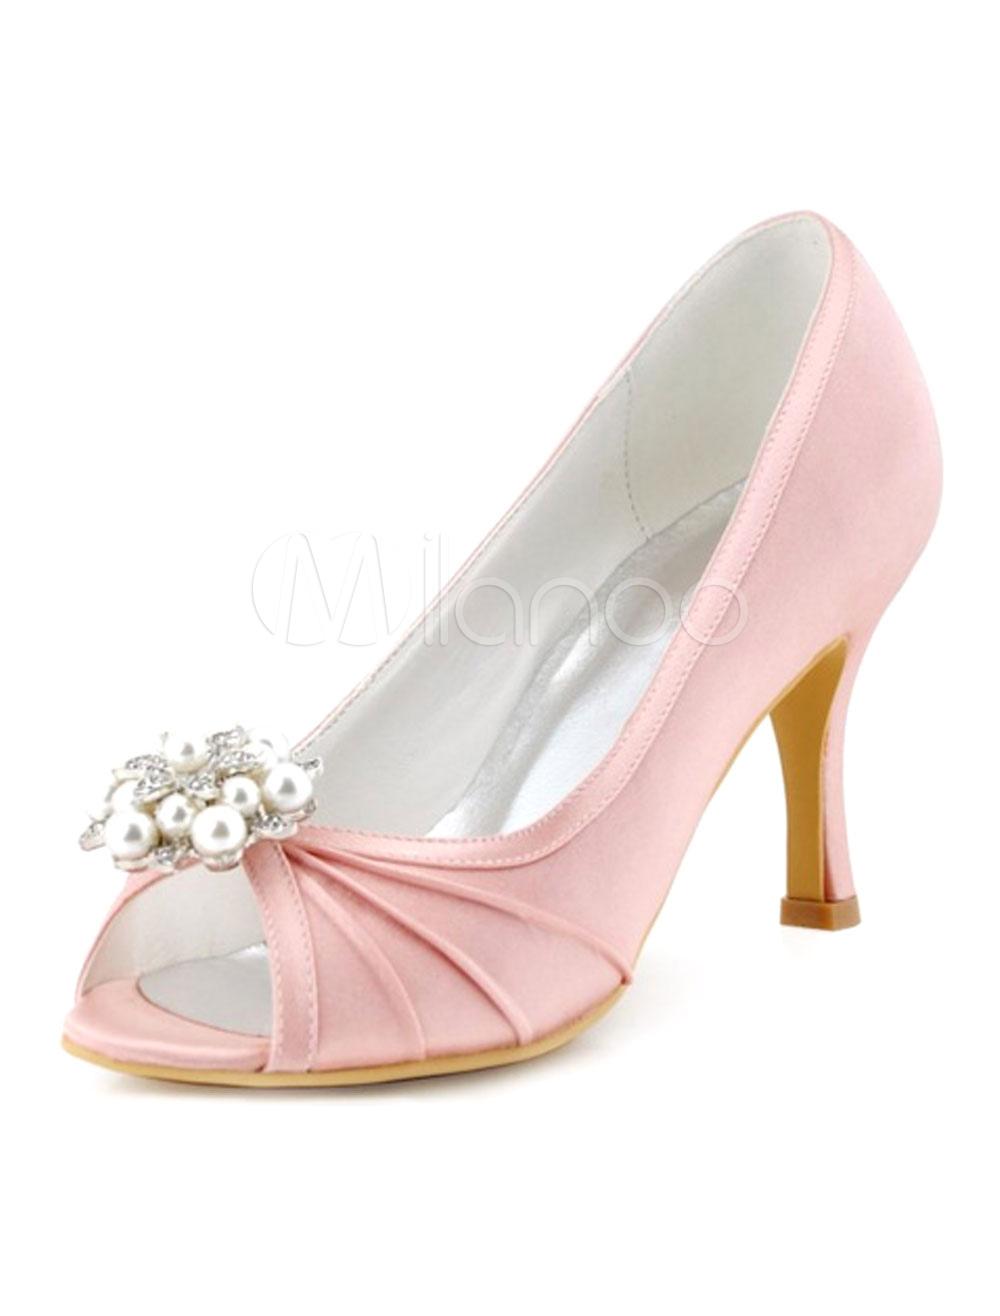 Pink Wedding Shoes Peep Toe Pearl Crystal Slip On High Heel Bridal Shoes